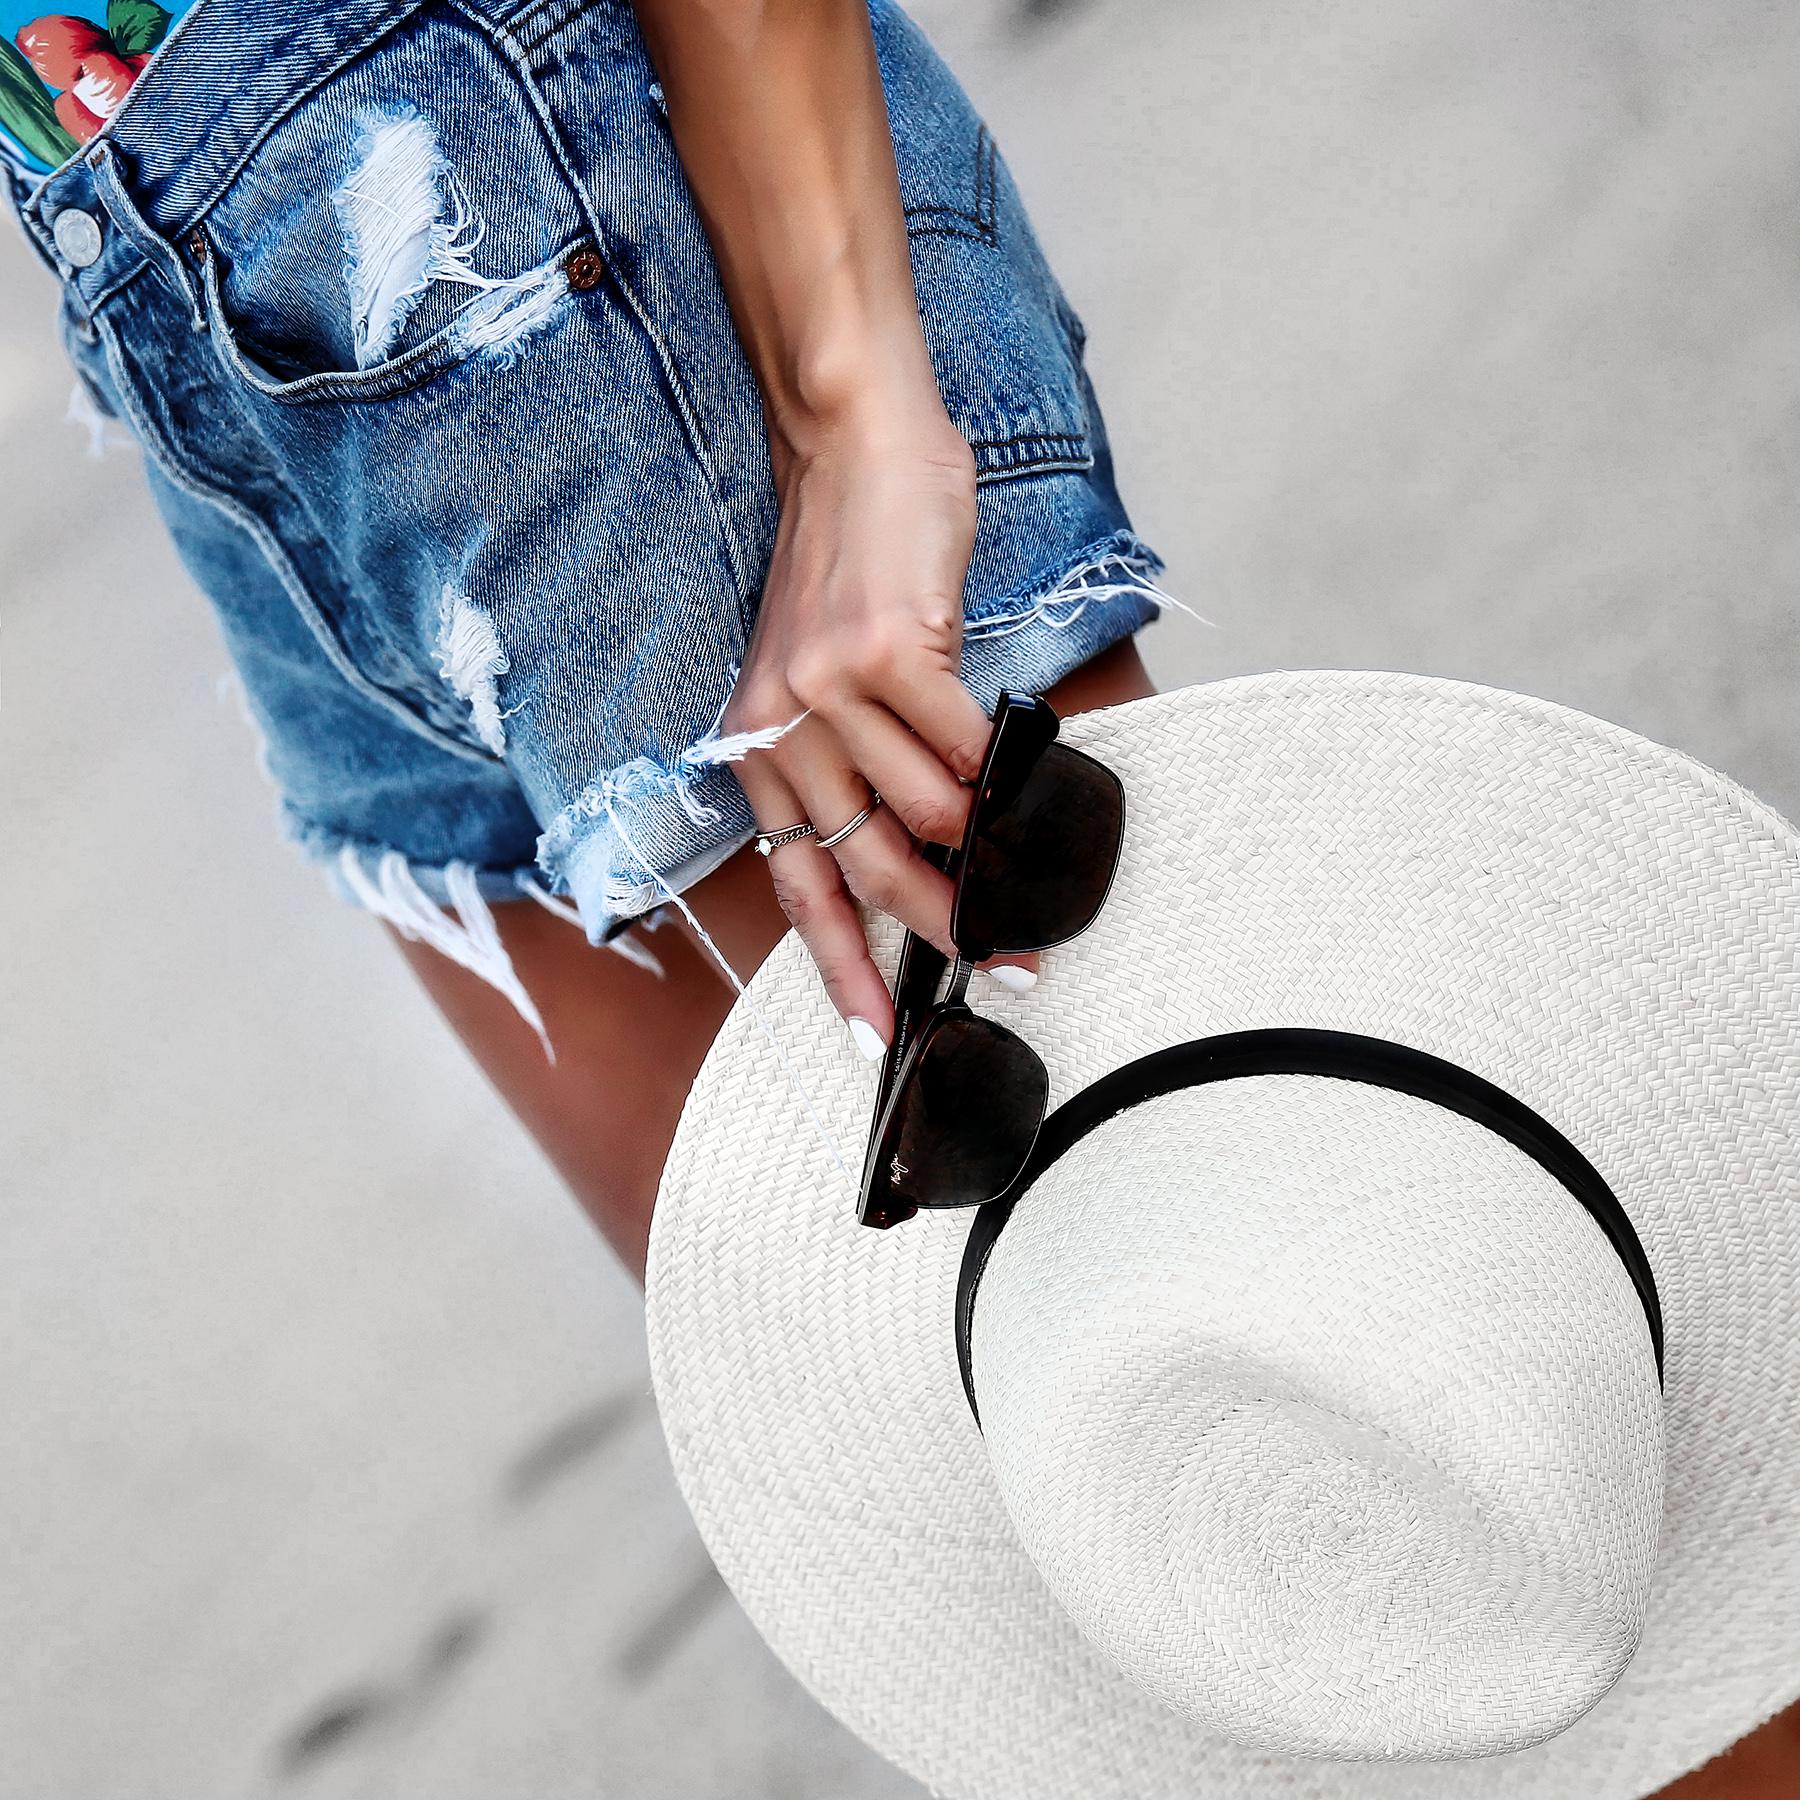 Maui Jim Sunglasses Levis Shorts Janessa Leone Panama Hat.jpg